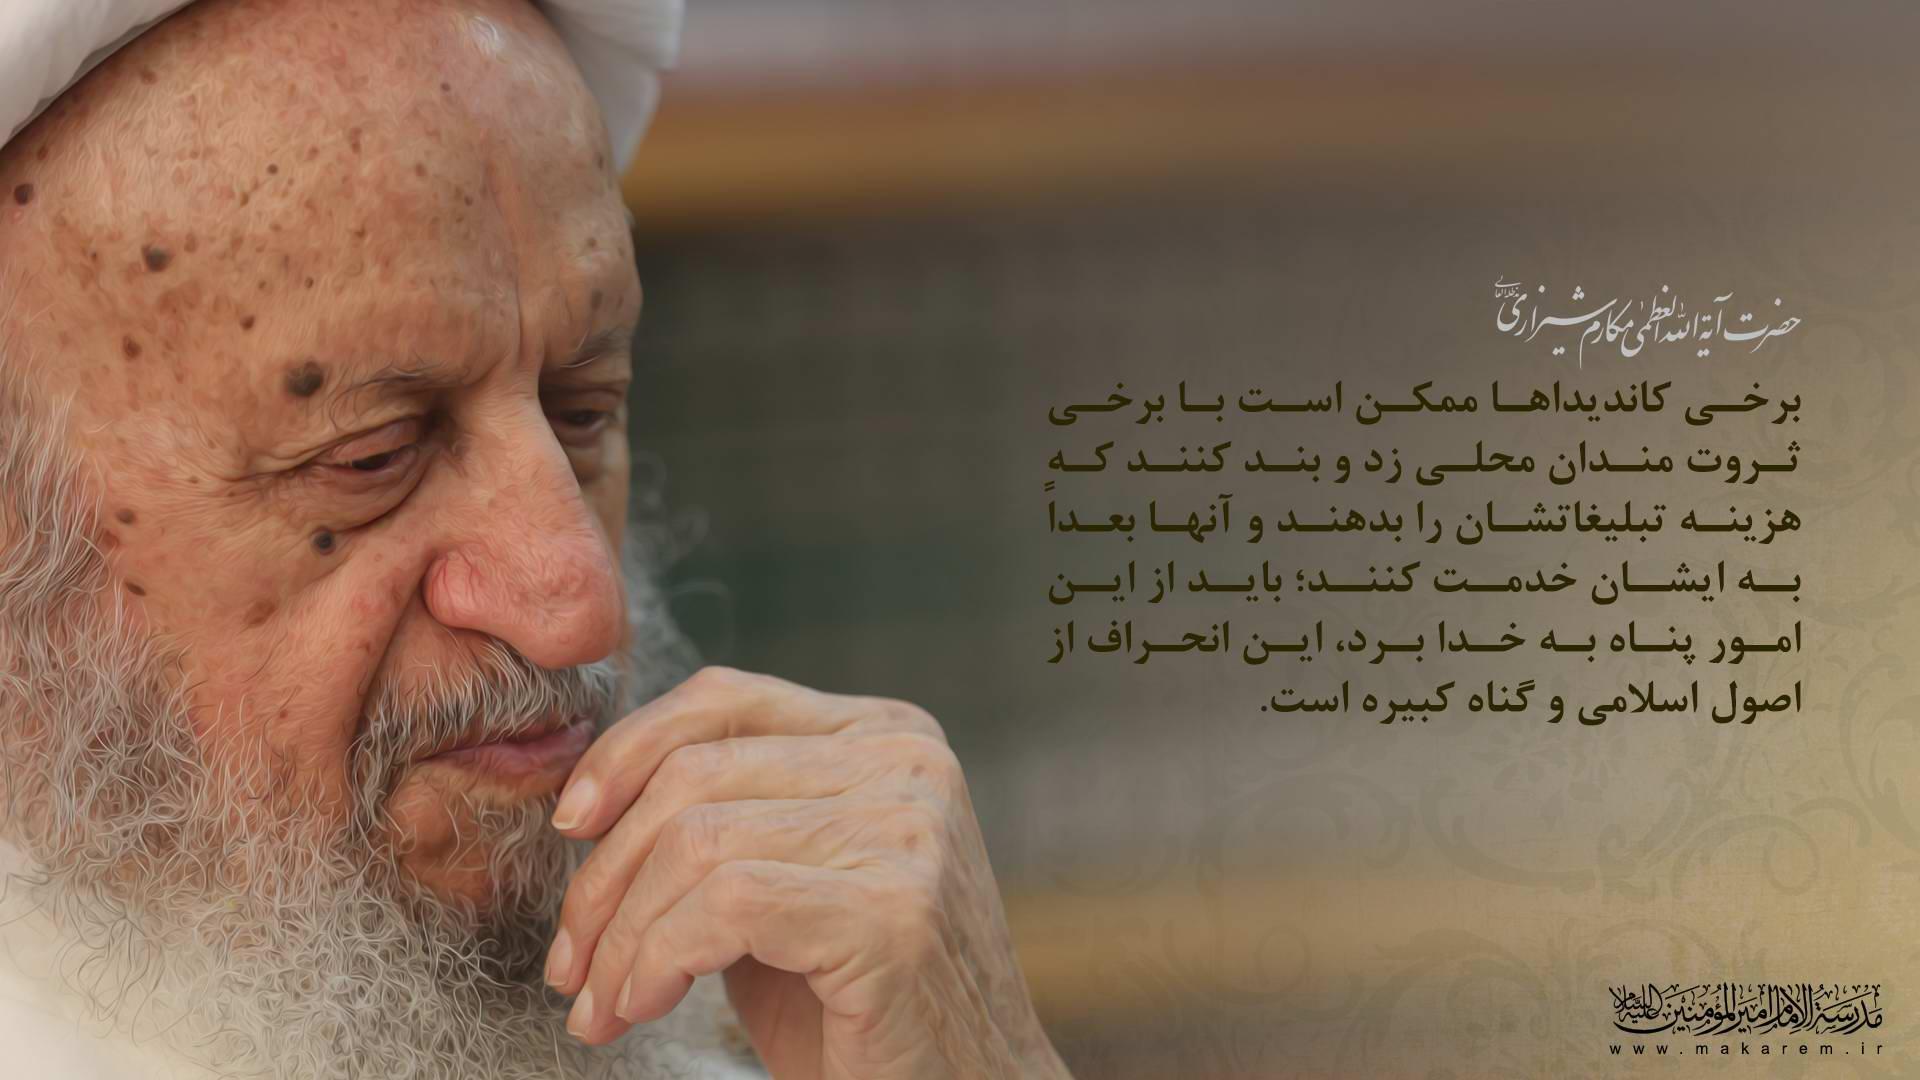 انتخابات 02-مدرسه الامام امیر المومنین (ع)